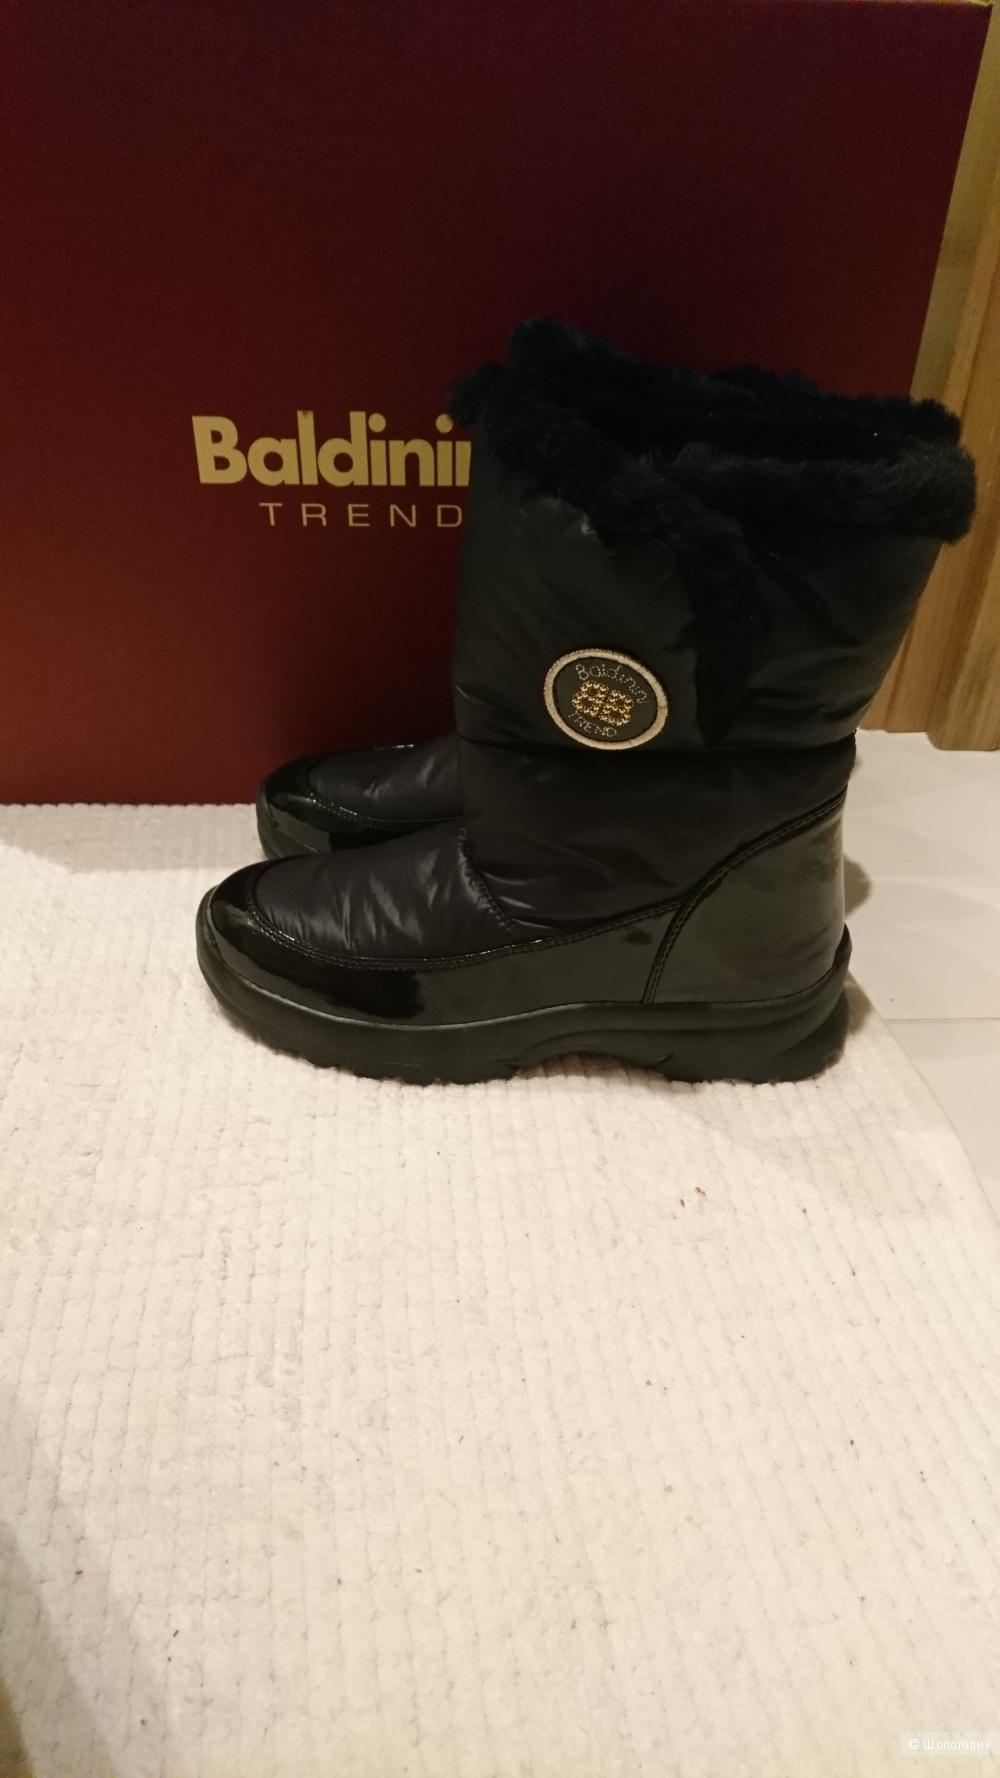 Зимние сапоги Baldinini Trend. Размер 38-39.